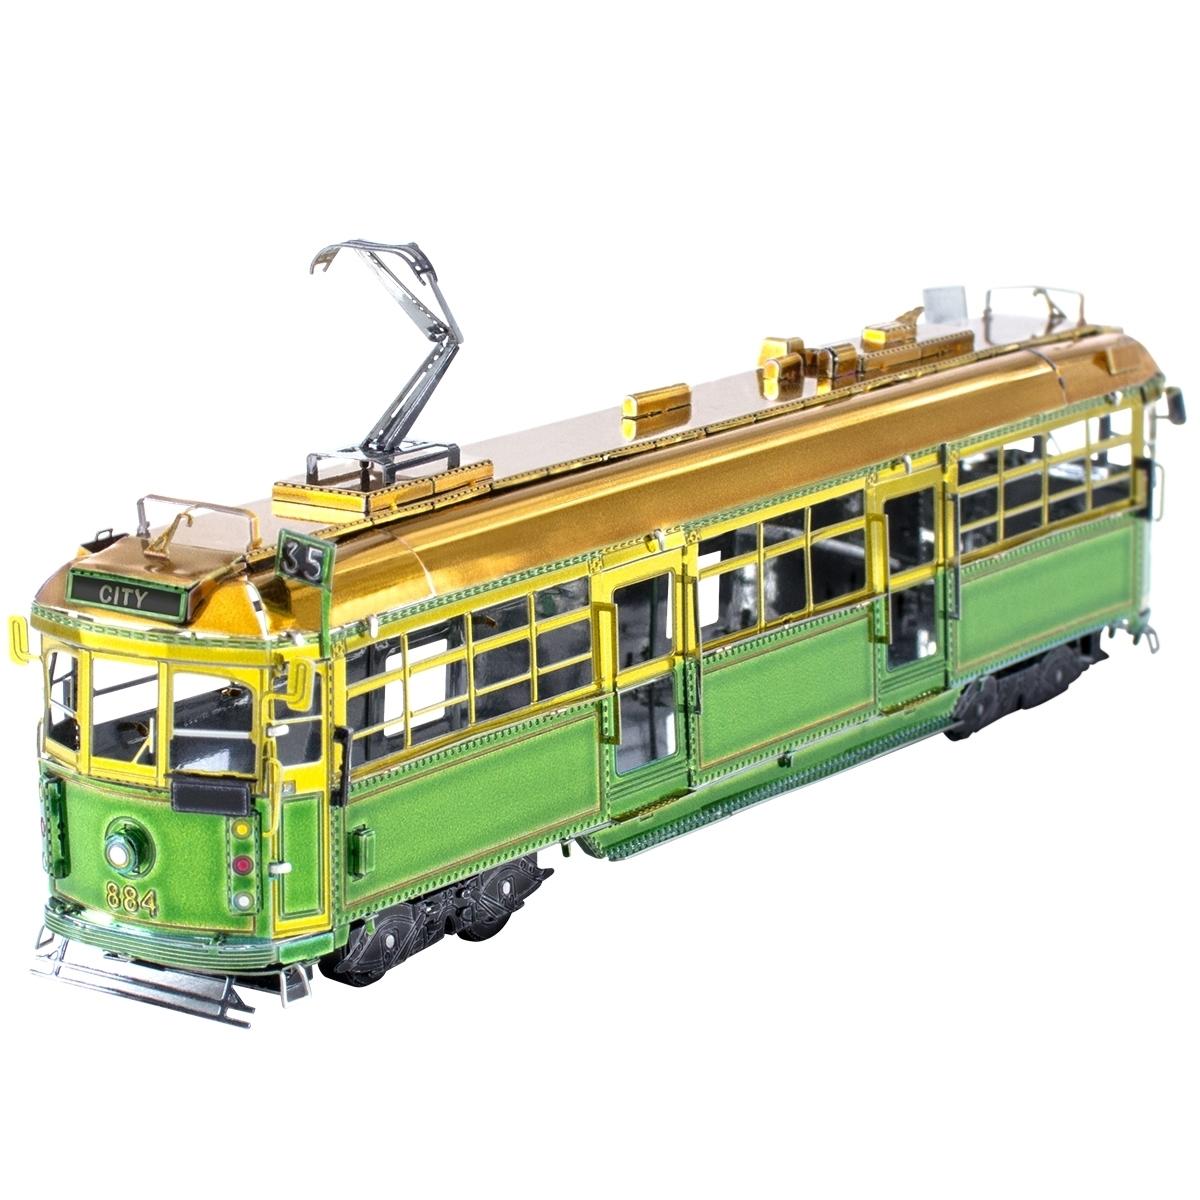 Fascinations Metal Earth Melbourne W-Class Tram Unassembled Color 3D Metal Model